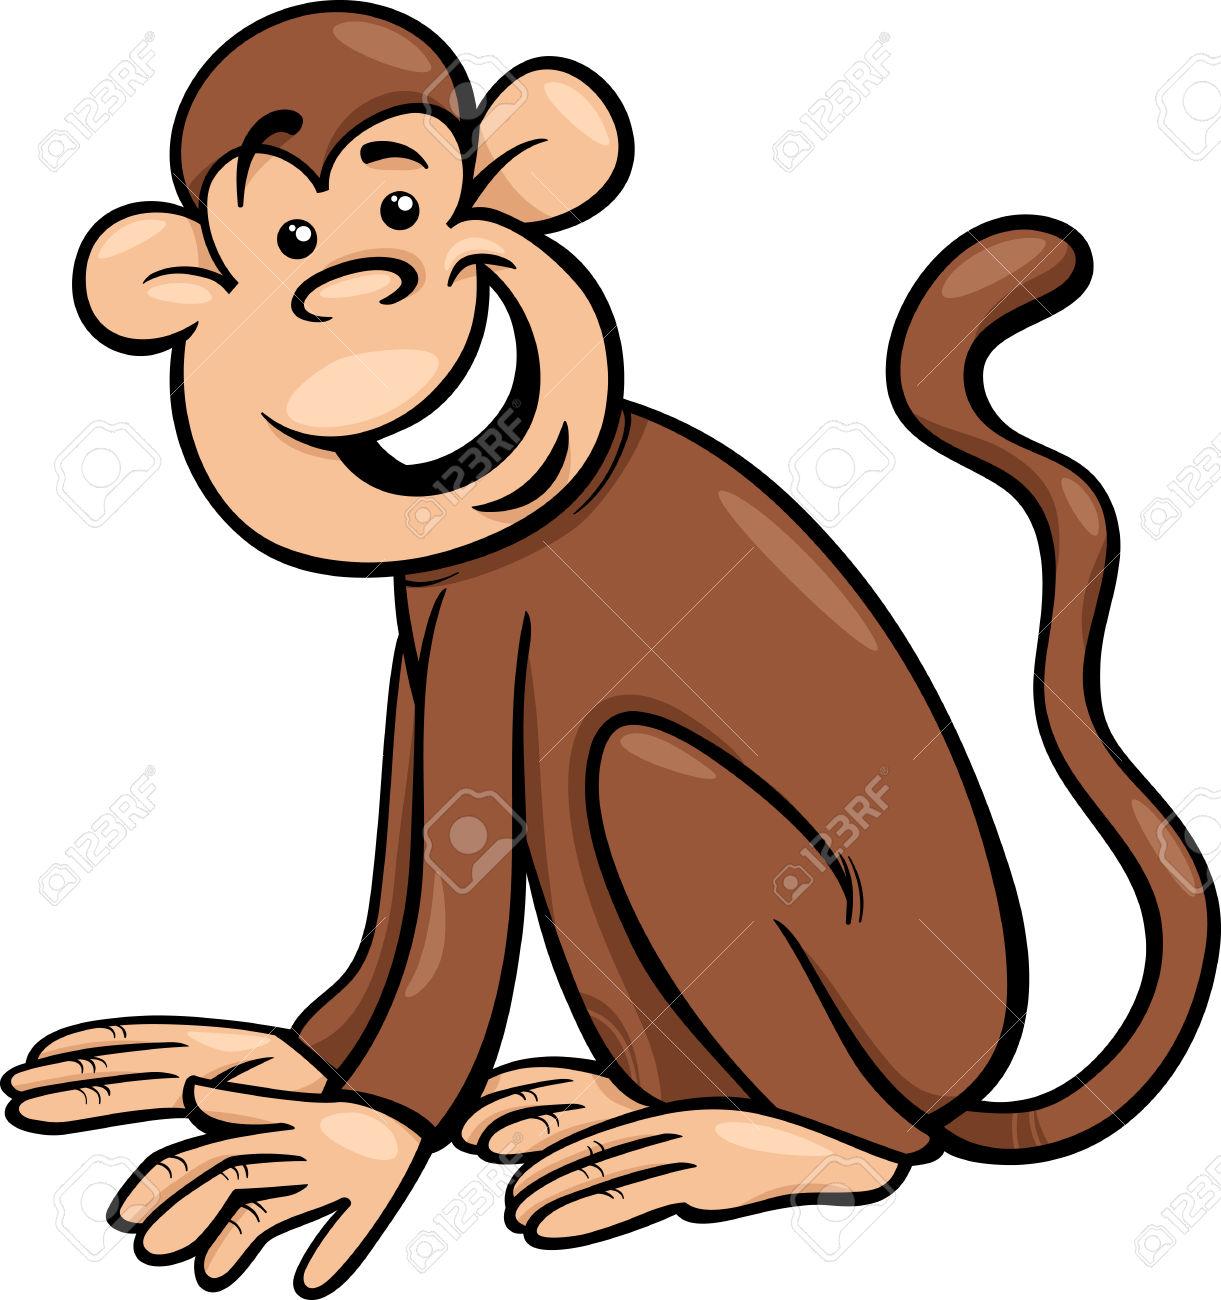 Cartoon Illustration Of Funny Monkey Primate Animal Royalty Free.